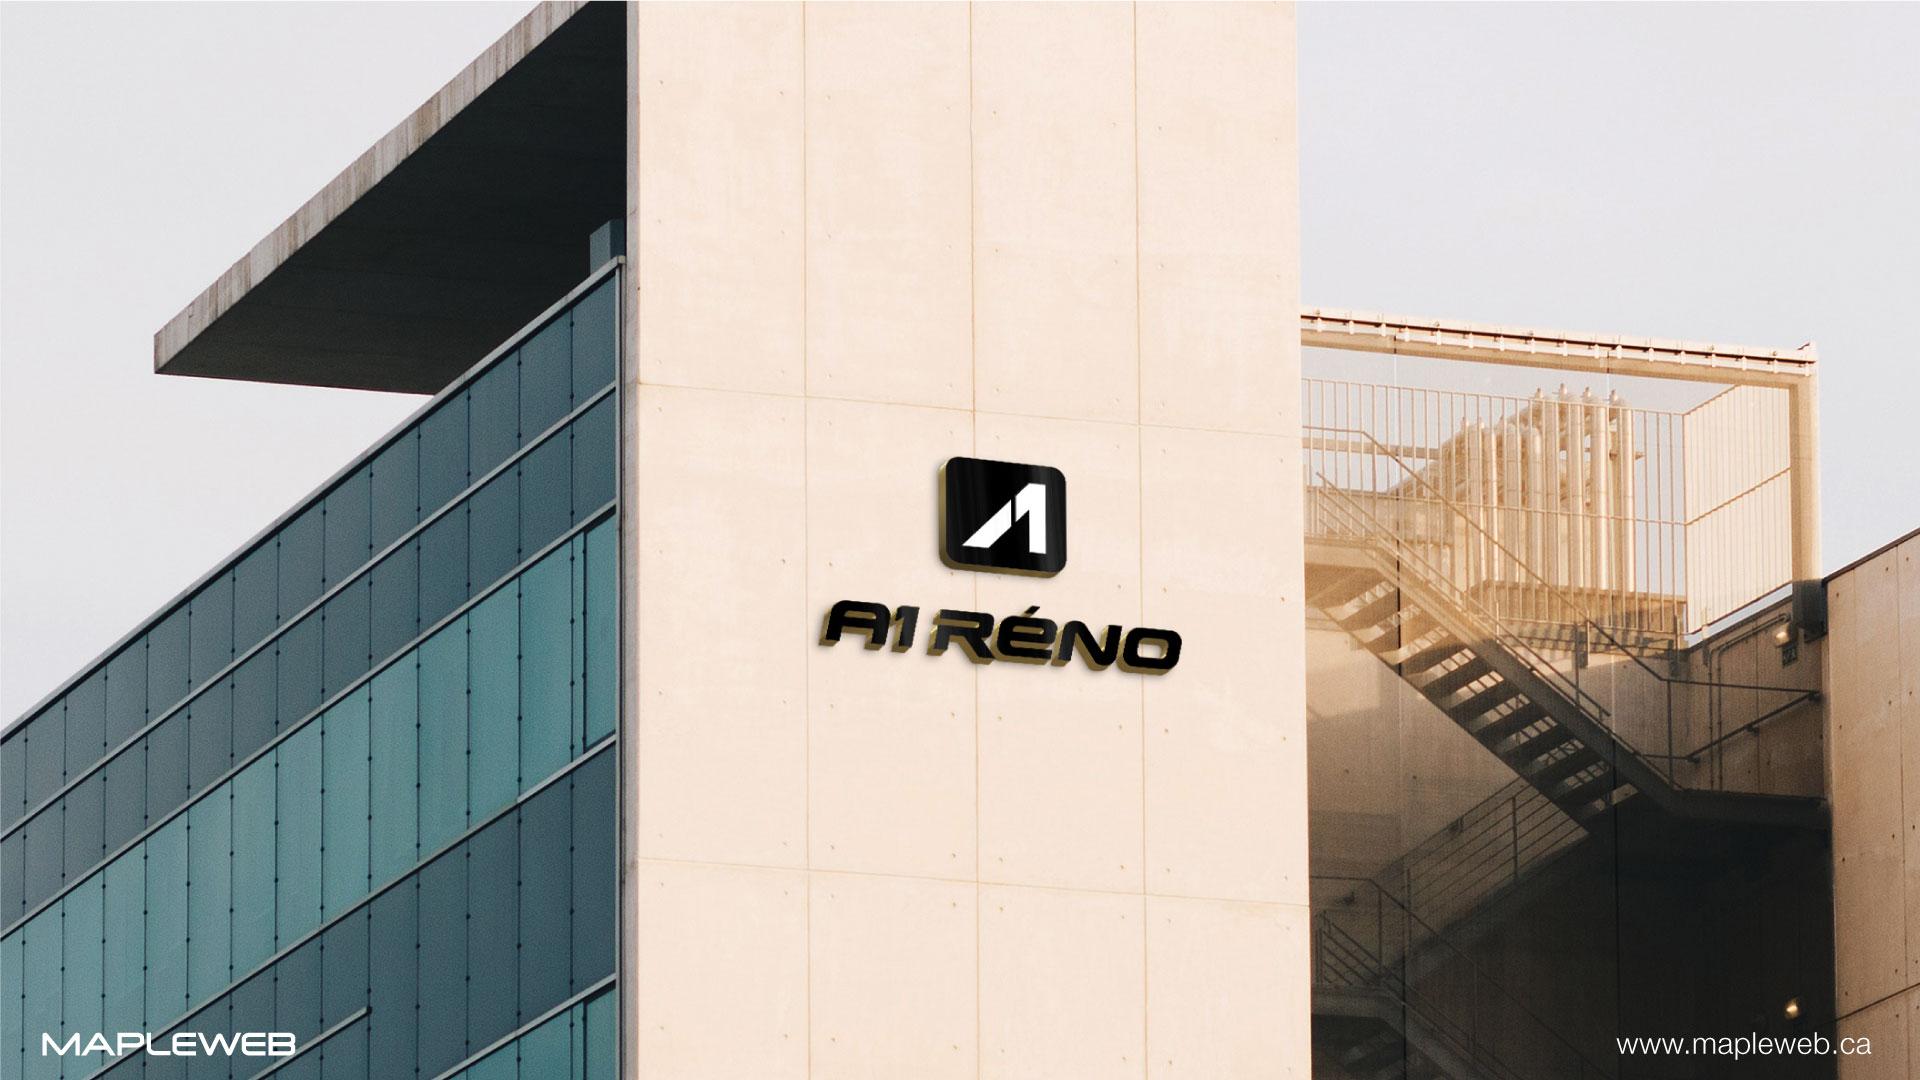 a1-reno-brand-logo-design-by-mapleweb-vancouver-canada-logo-on-white-building-mock